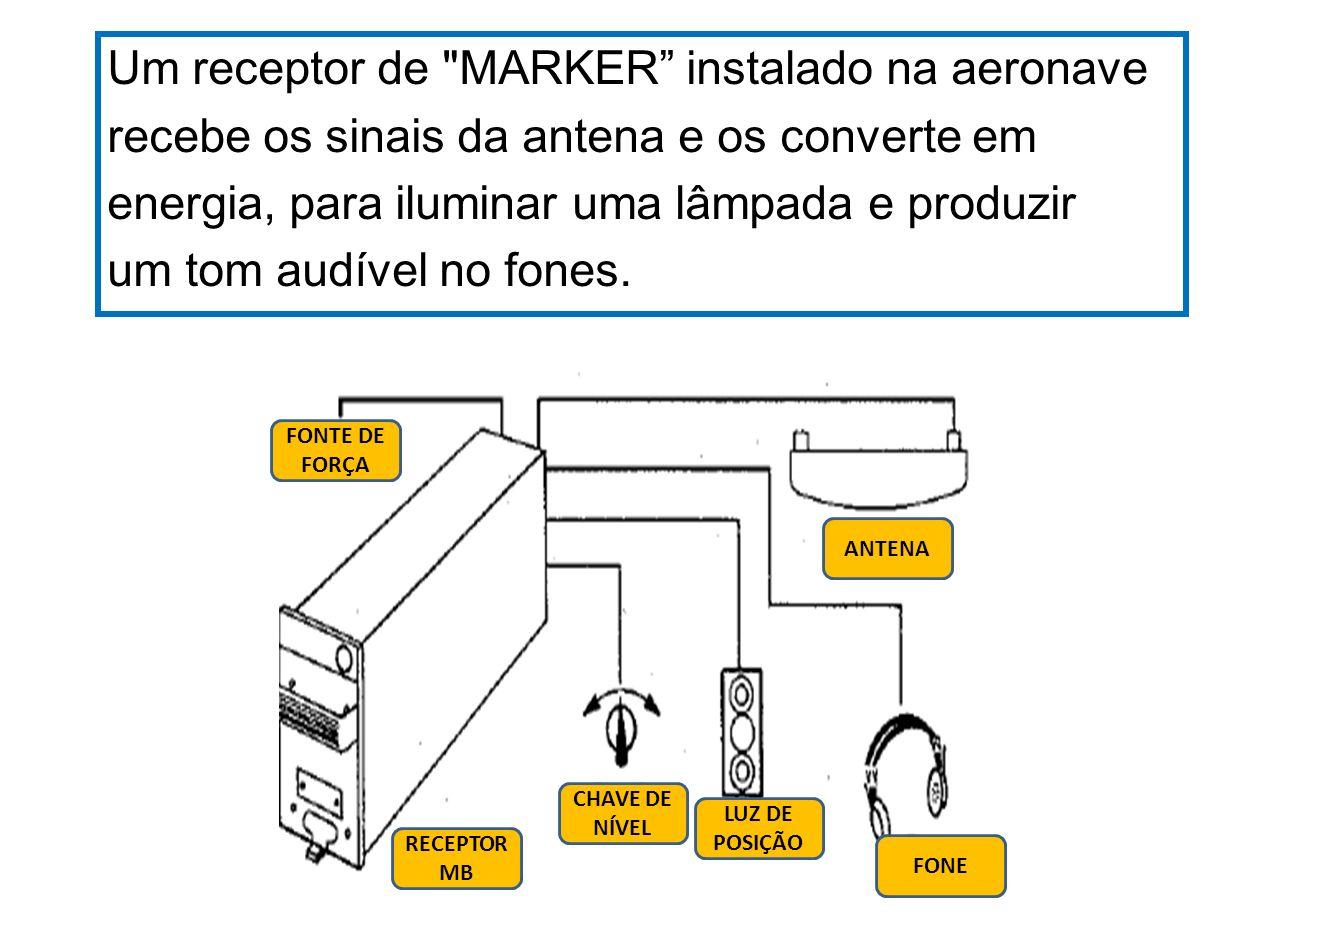 75 MHz 400 Hz 1300 Hz 3000 Hz OUTER MARKER MIDDLE MARKER INNER MARKER 7,2 Km 1 Km 300 m